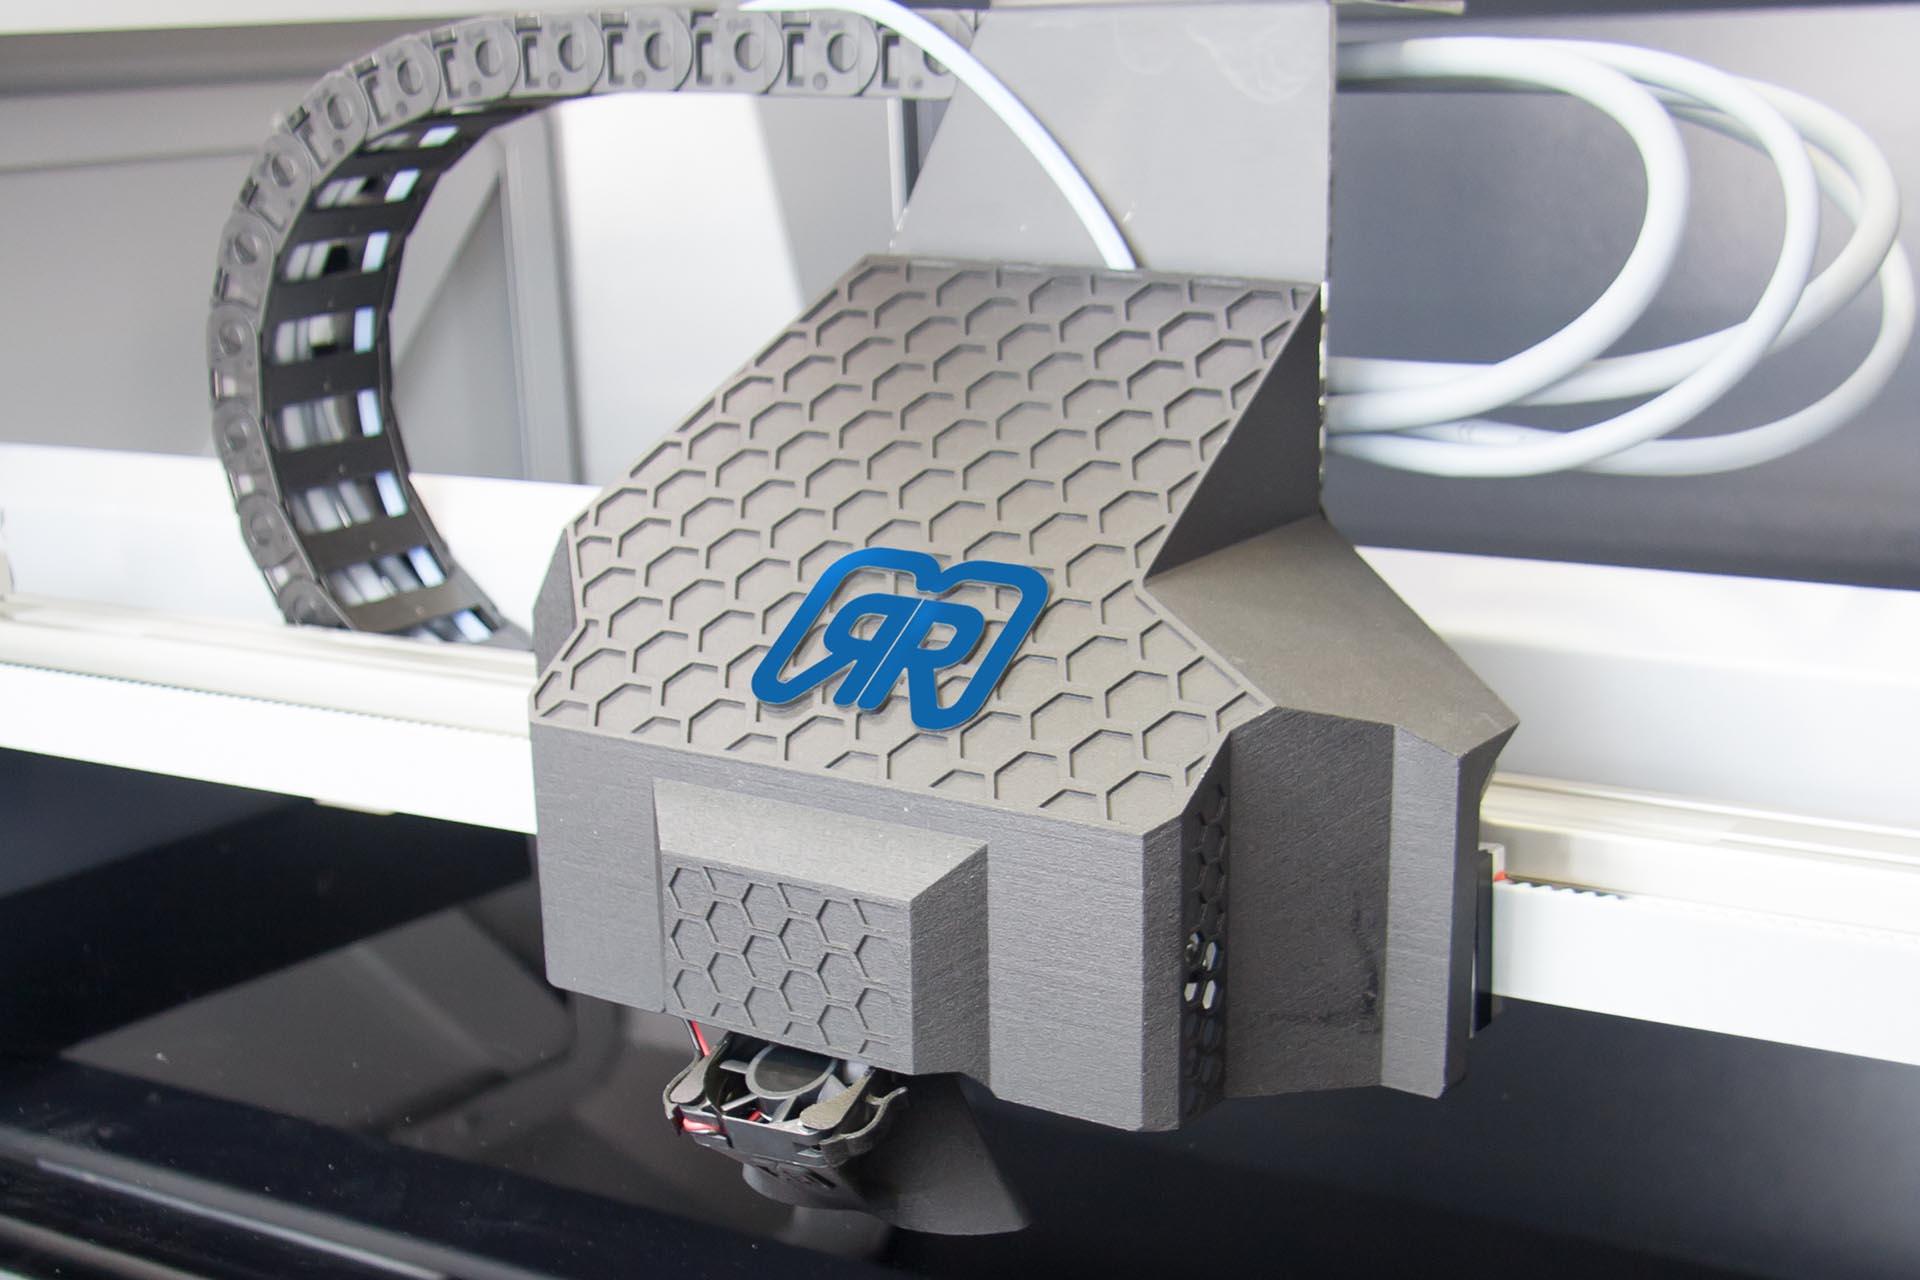 3D Drucker - x1000 Direct Drive DD3 Extruder